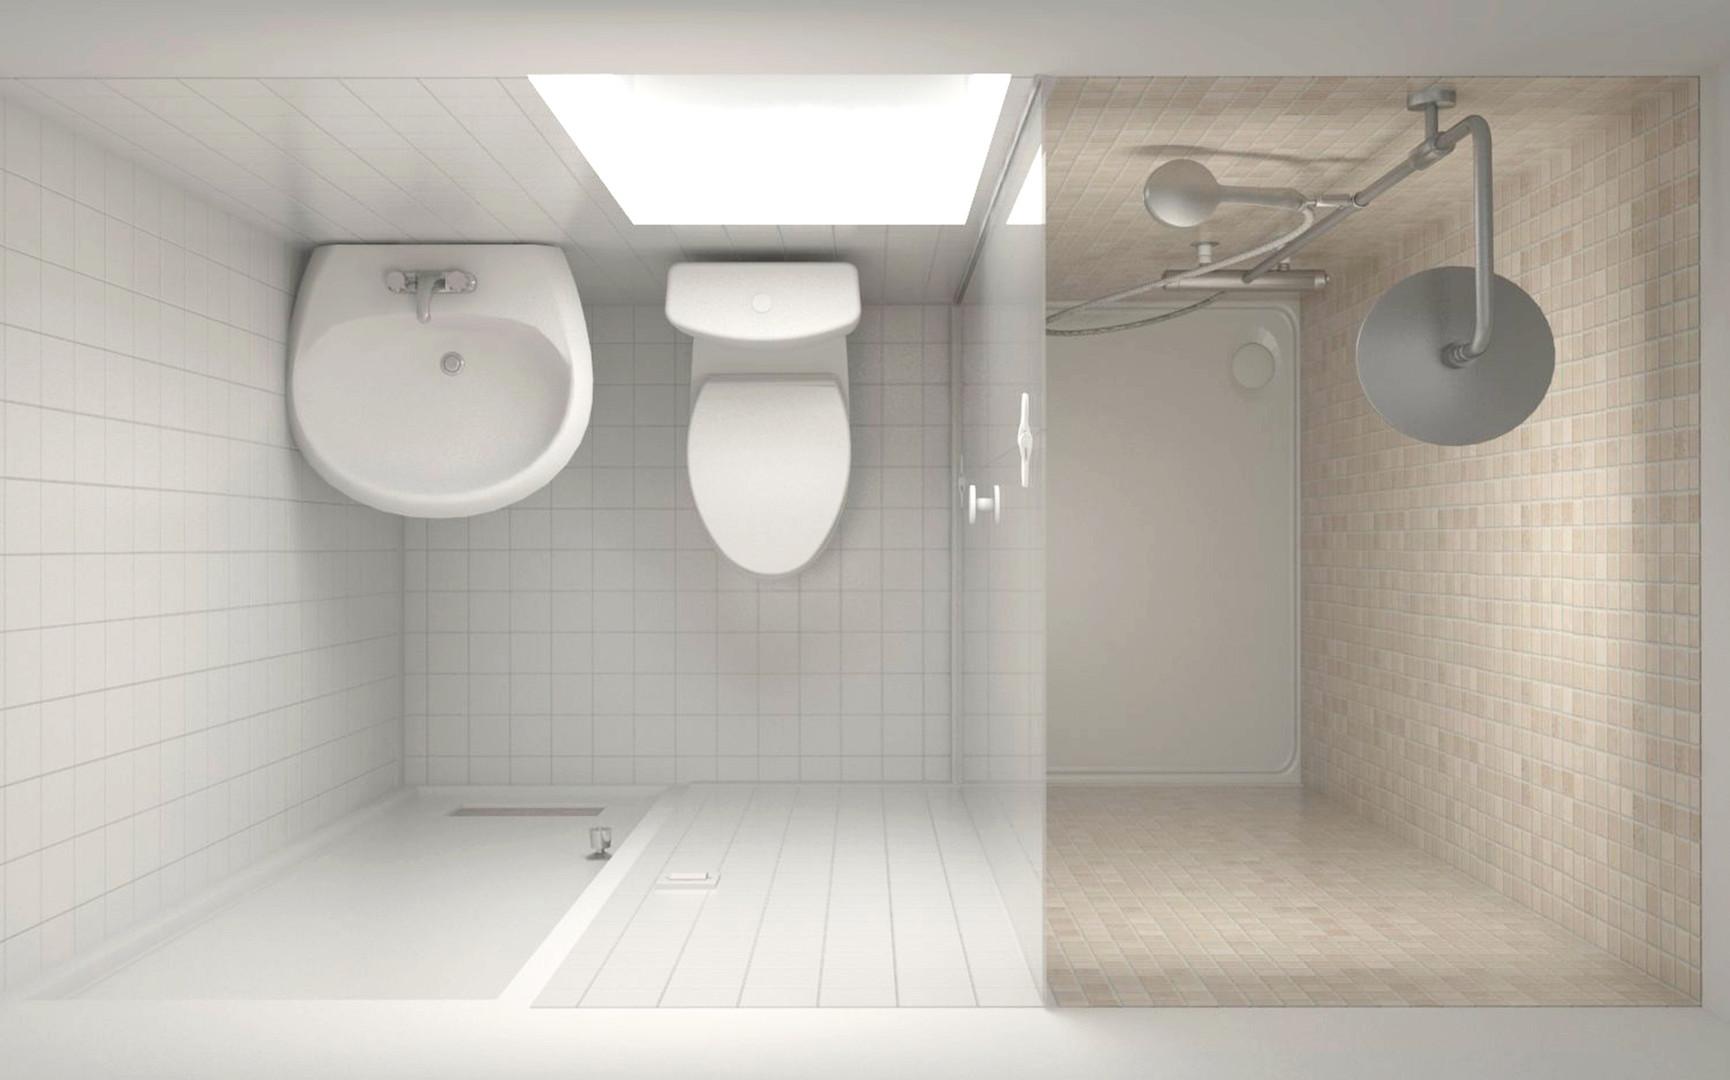 TOILET AND BATHROOM.jpg